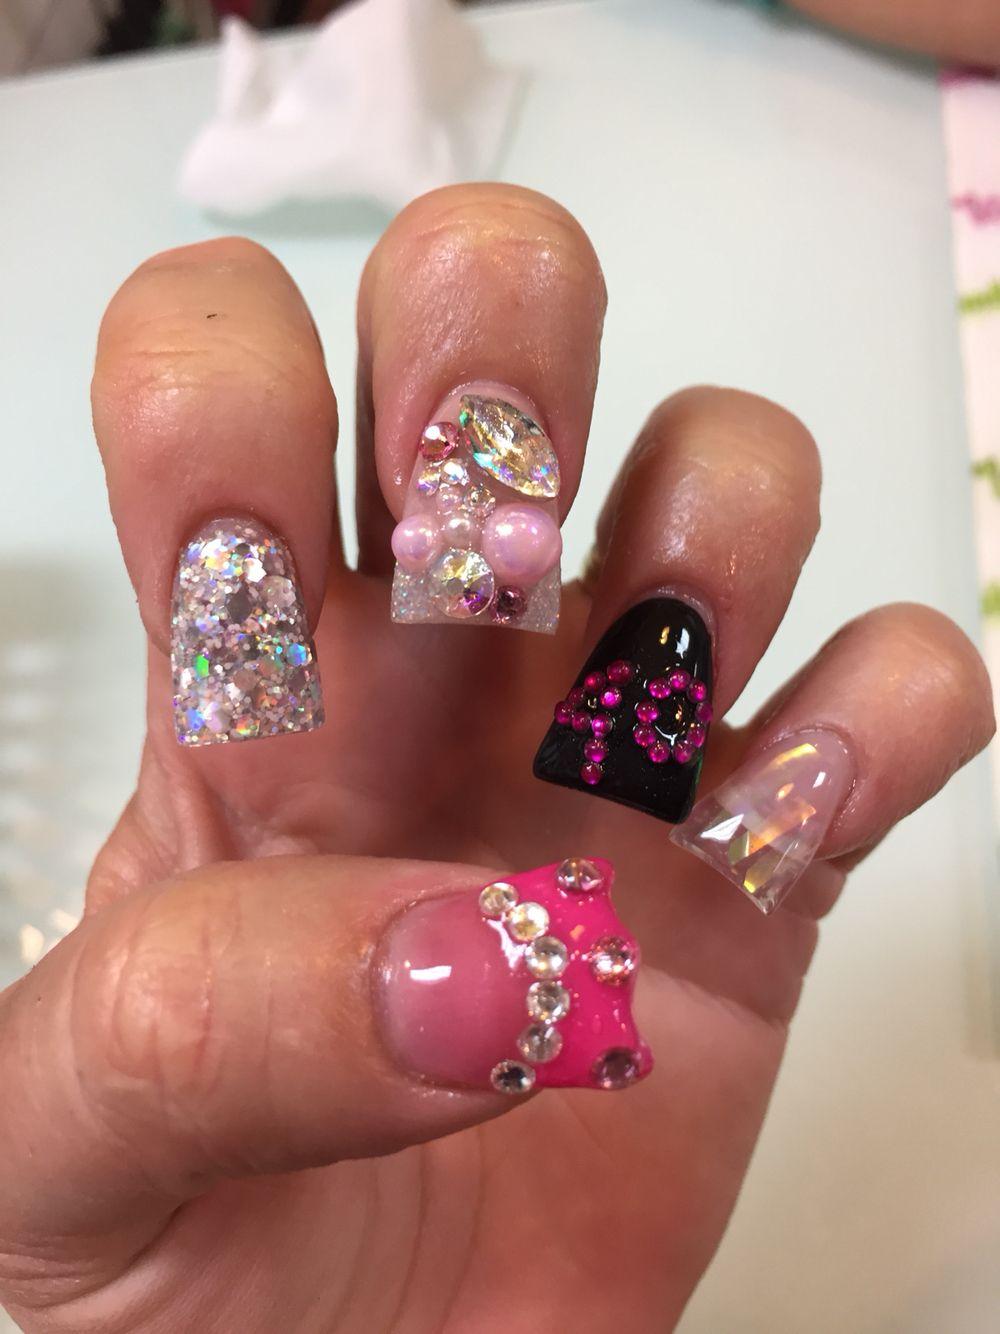 40th birthday nails! #birthday nails #40th